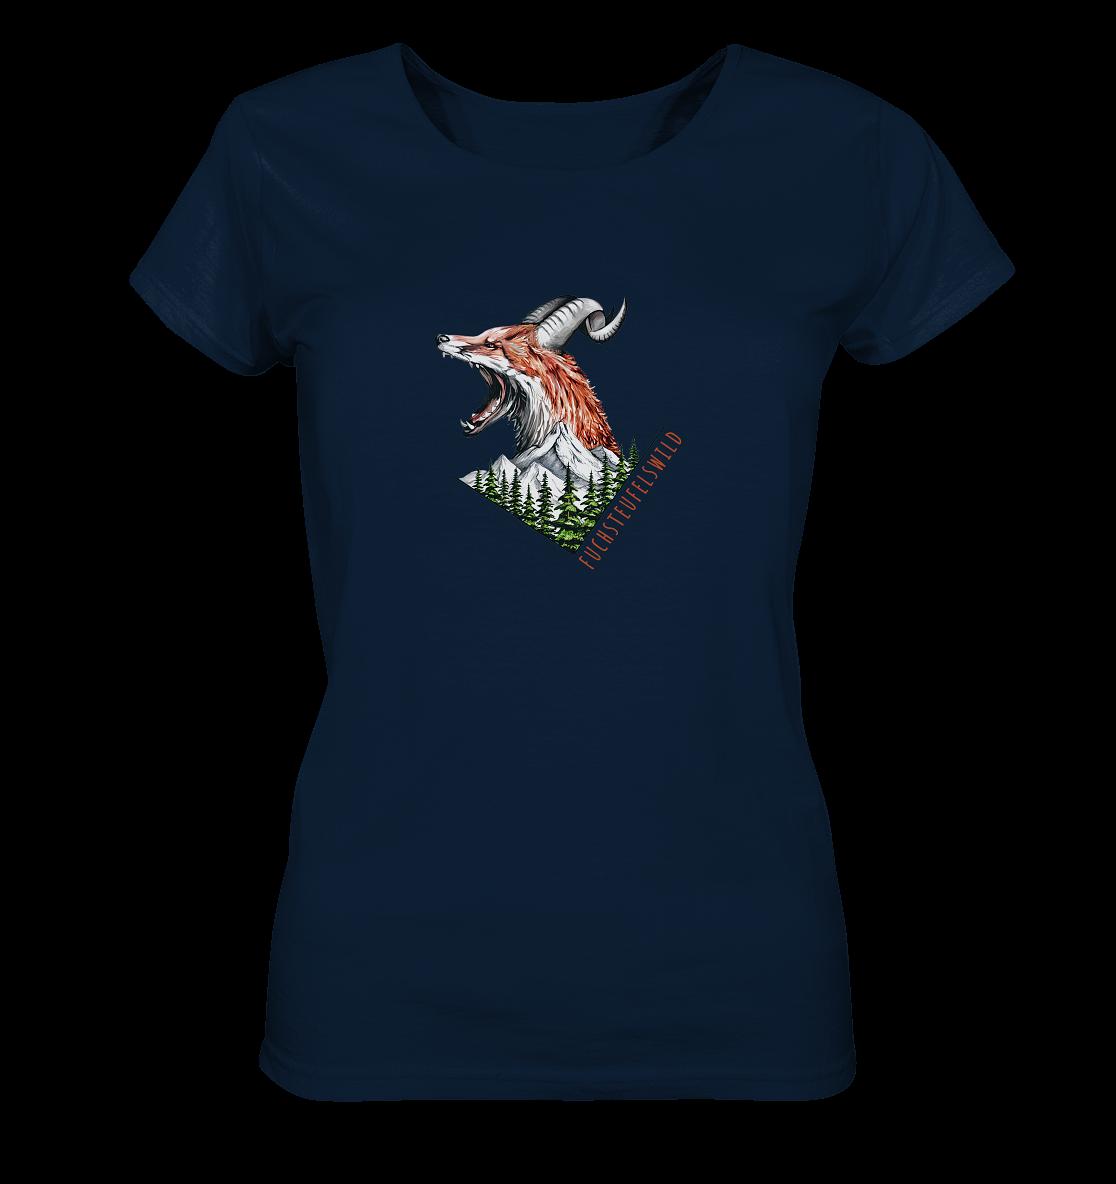 front-ladies-organic-shirt-0e2035-1116x-1.png